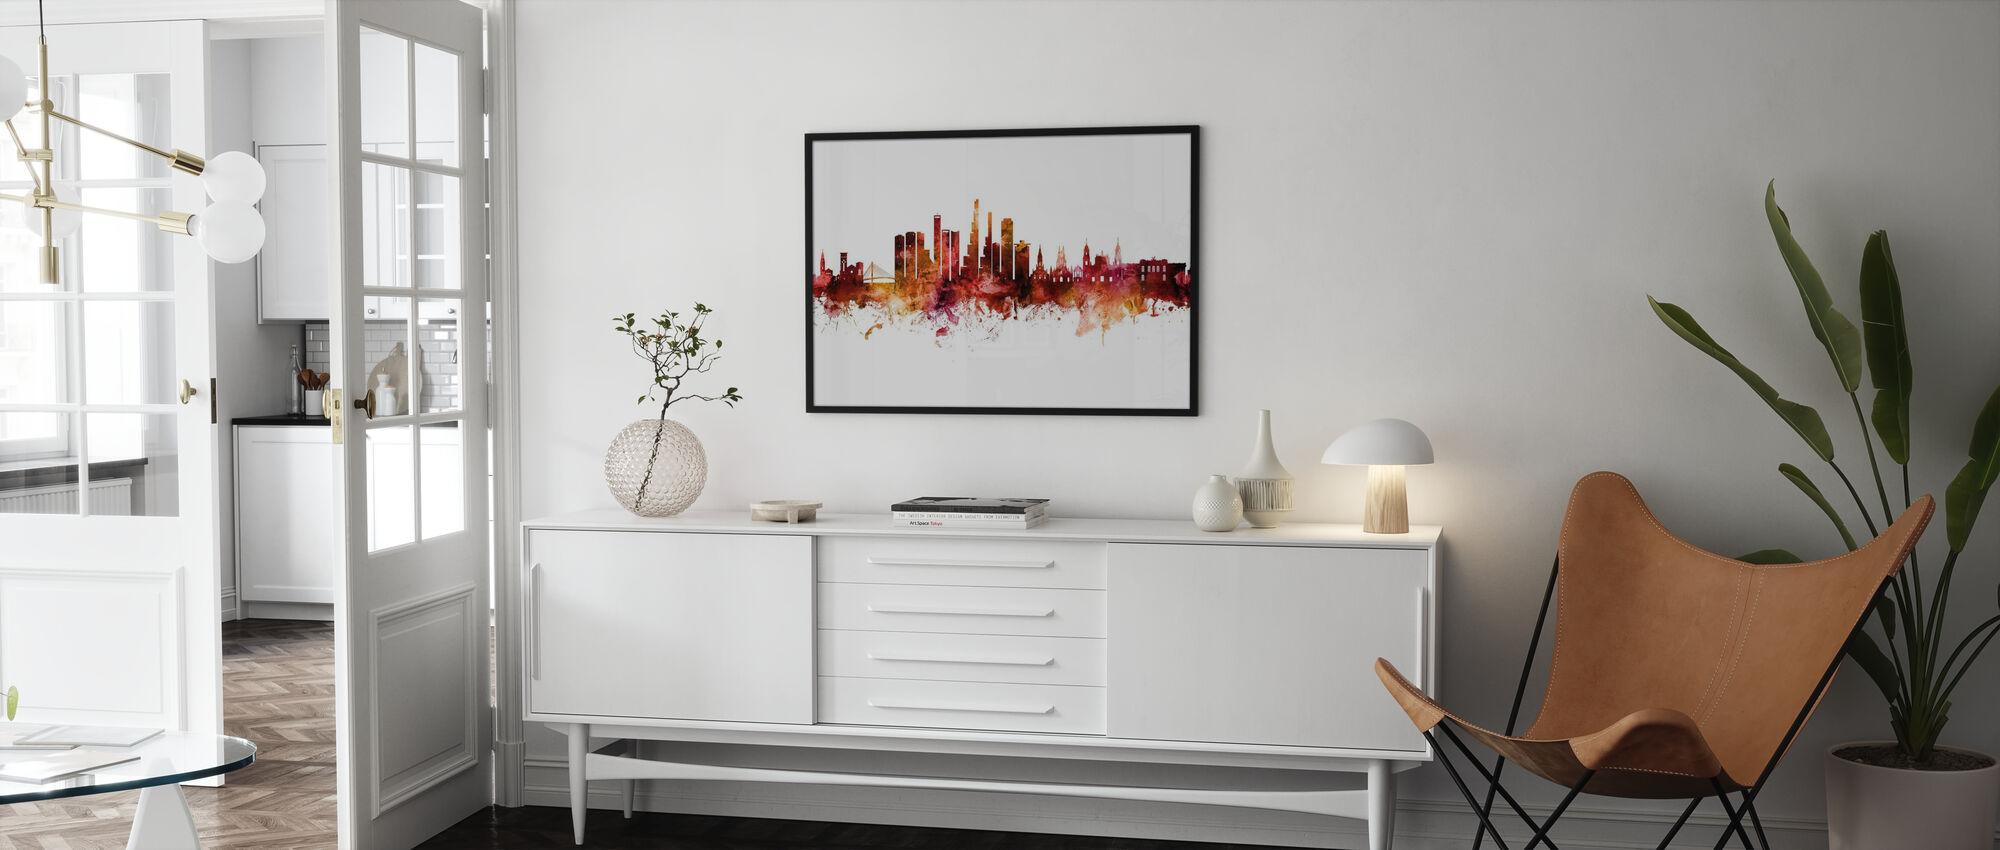 Bogota Colombia Skyline - Framed print - Living Room